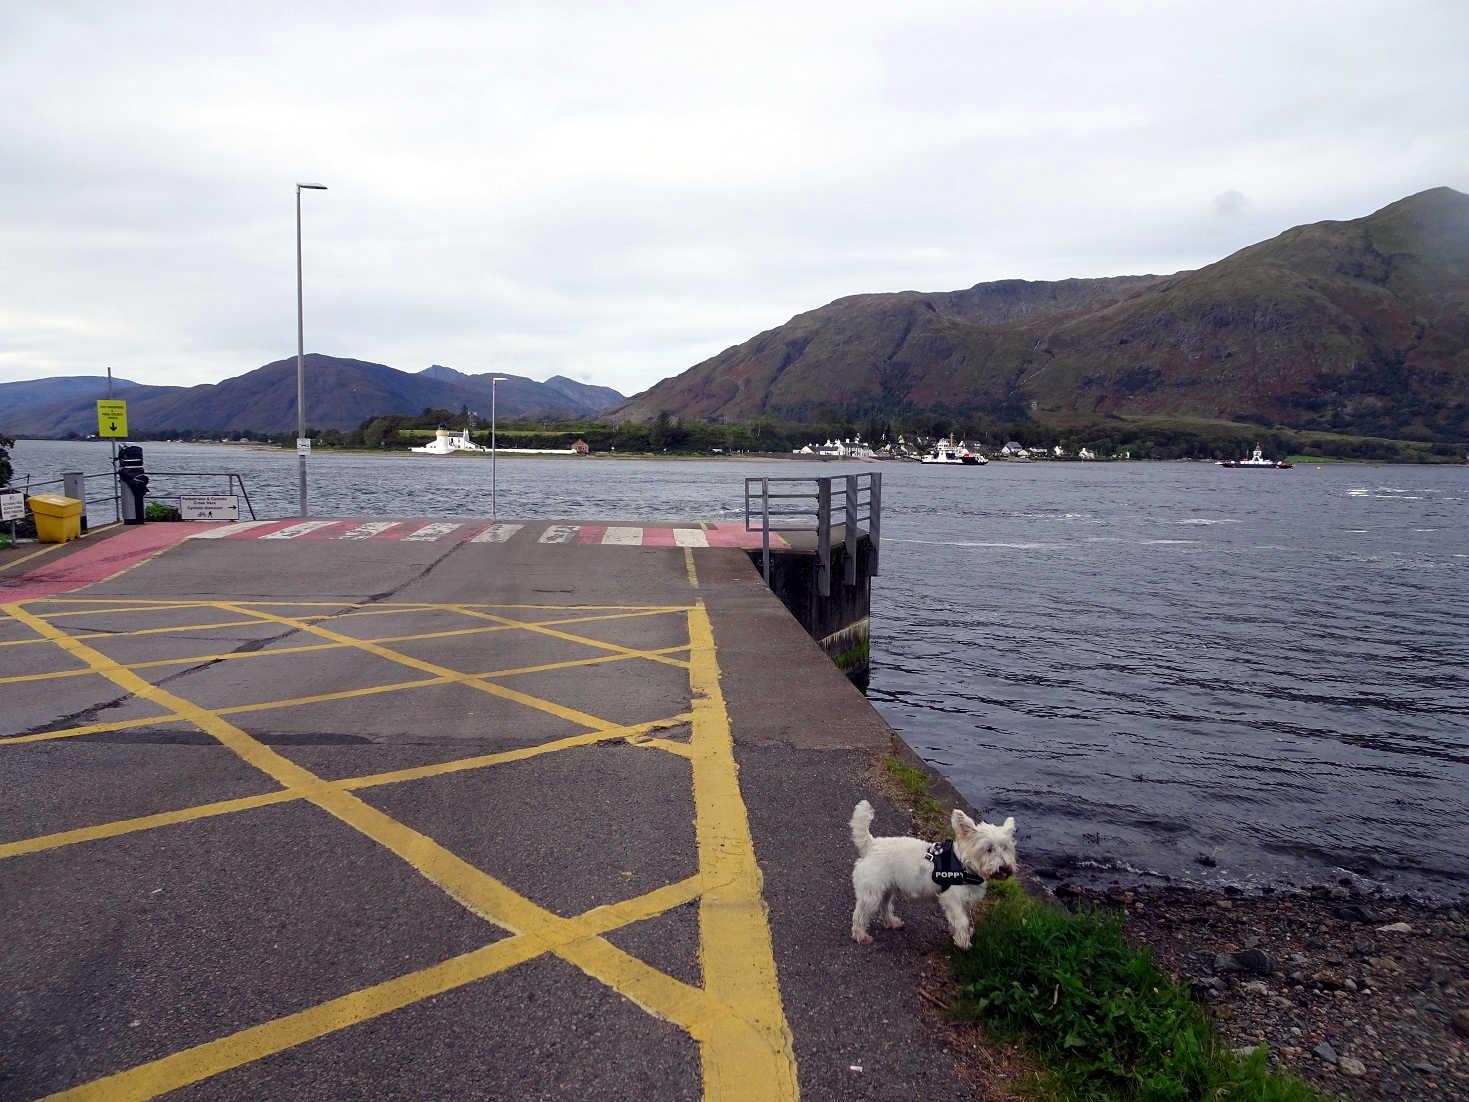 poppysocks at the corran ferry